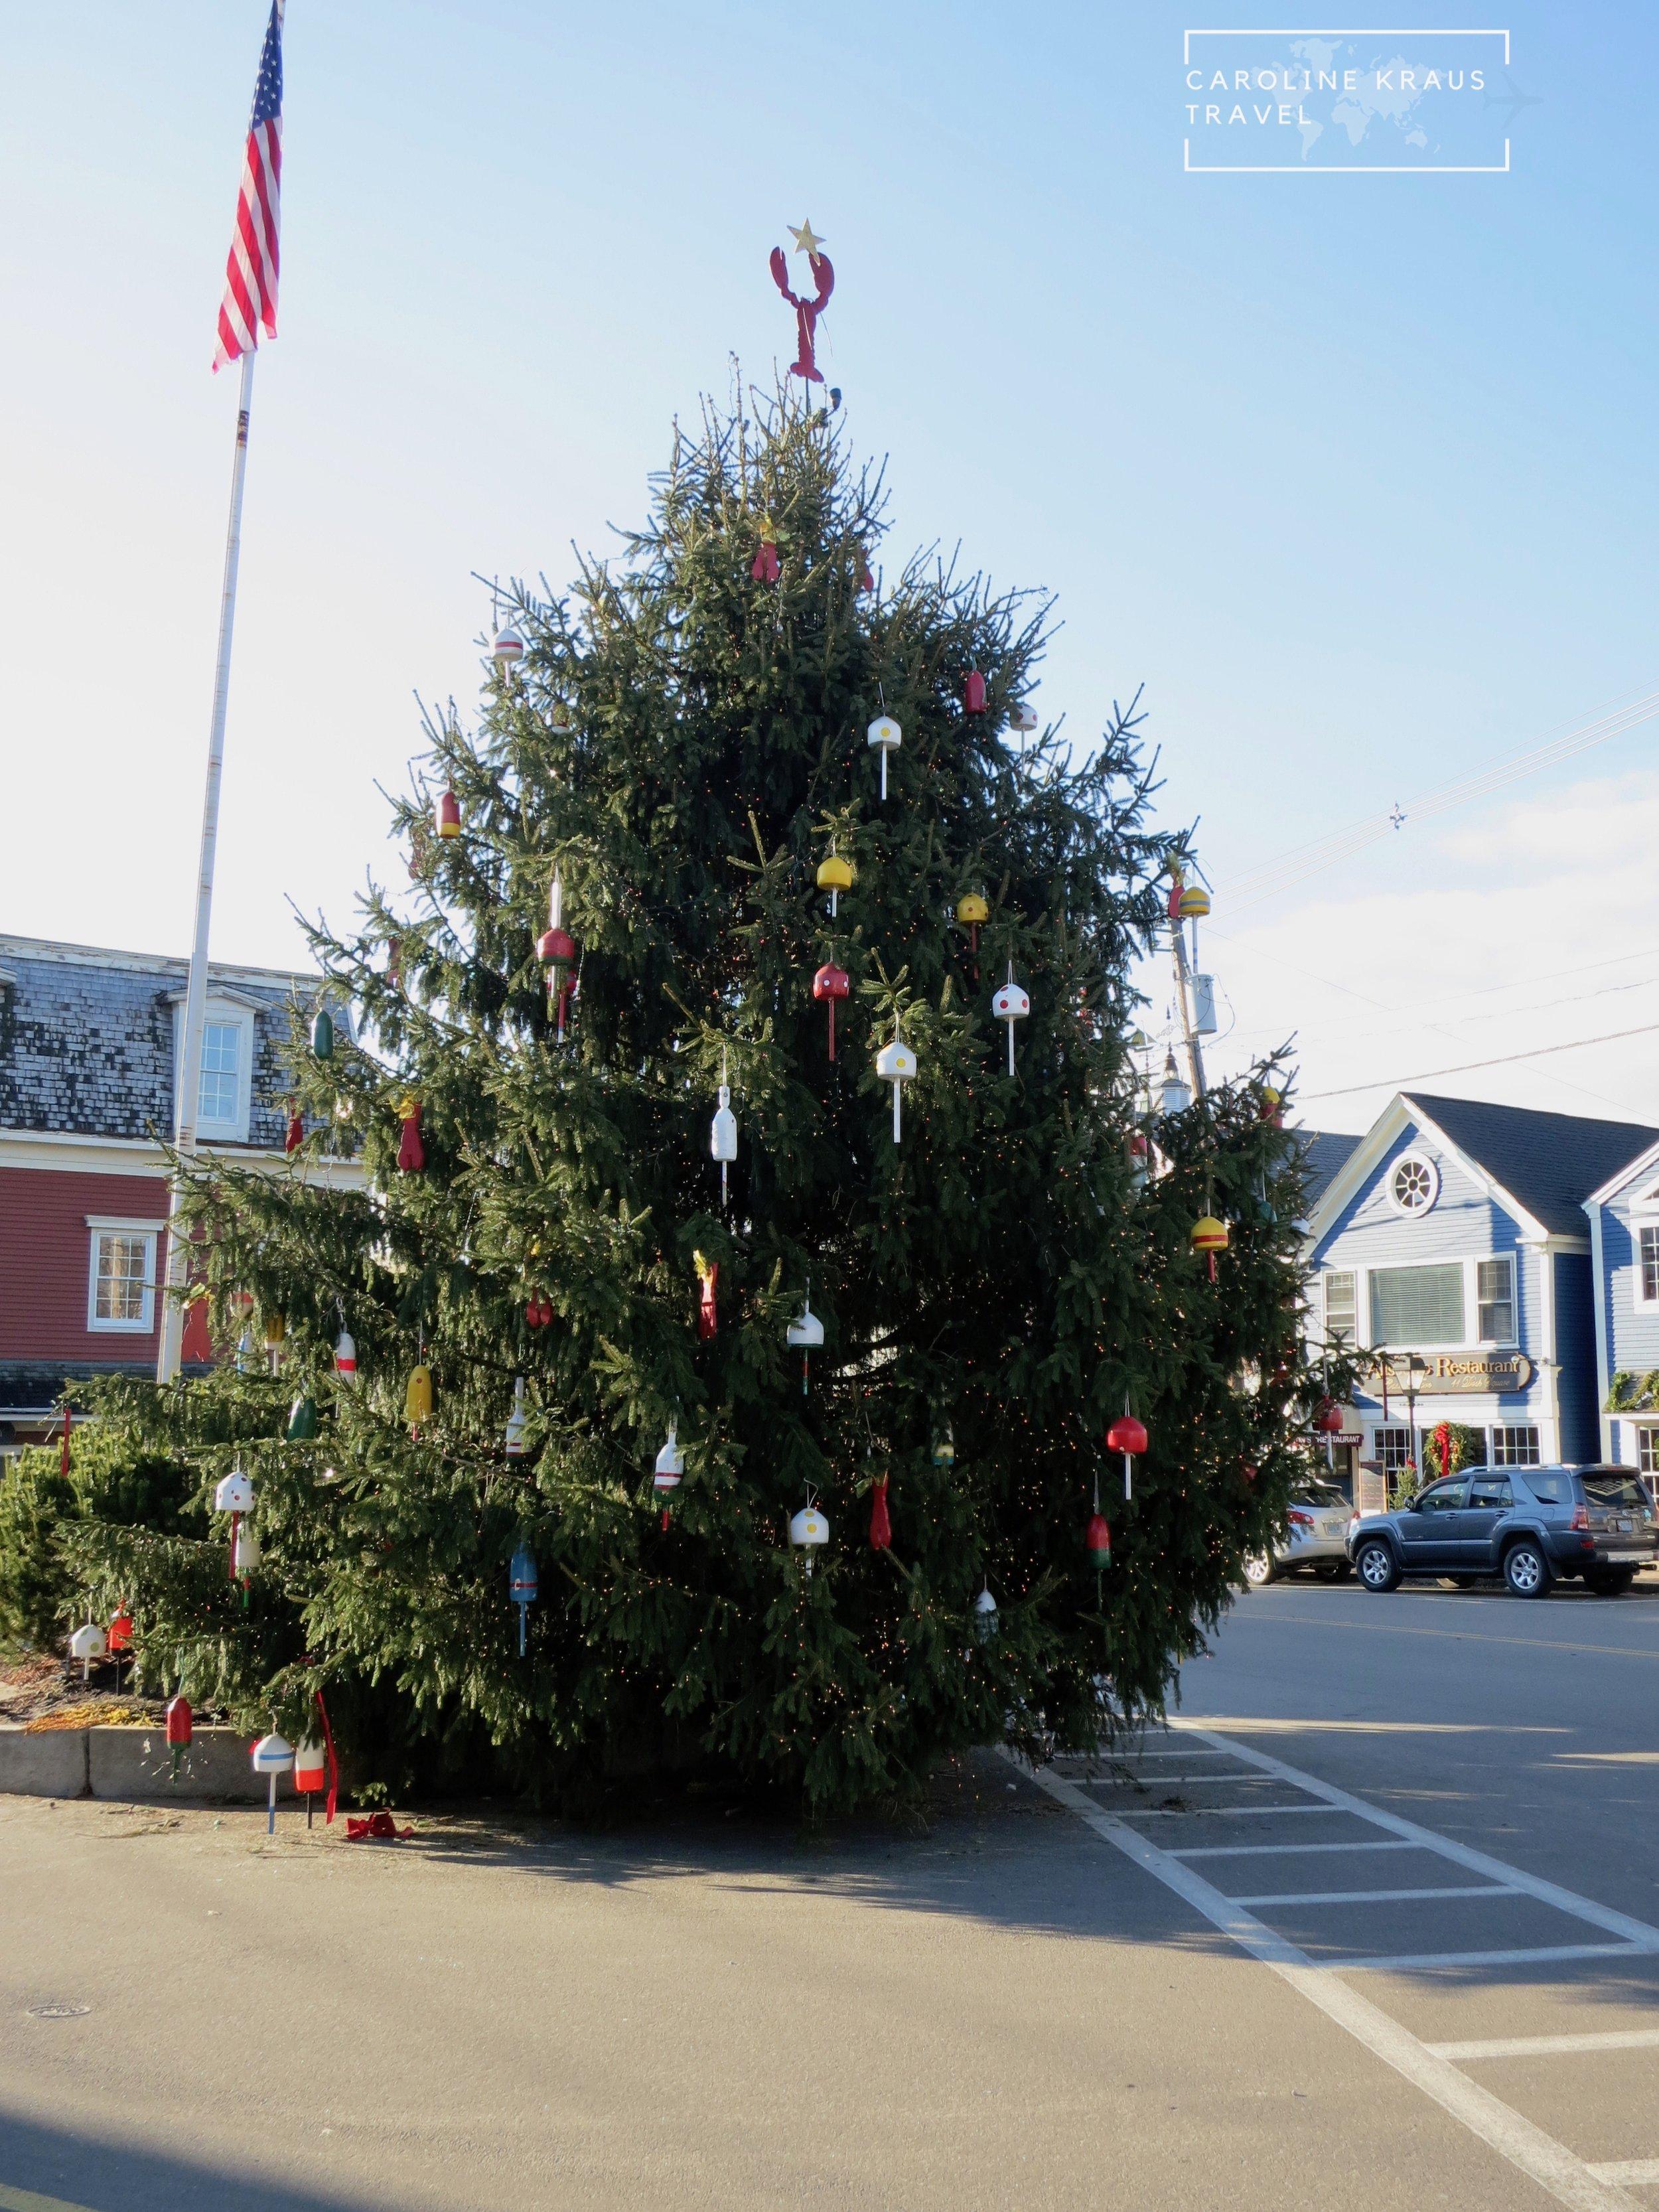 The Quaint Charm of Kennebunkport, Maine | carolinelkraus.com